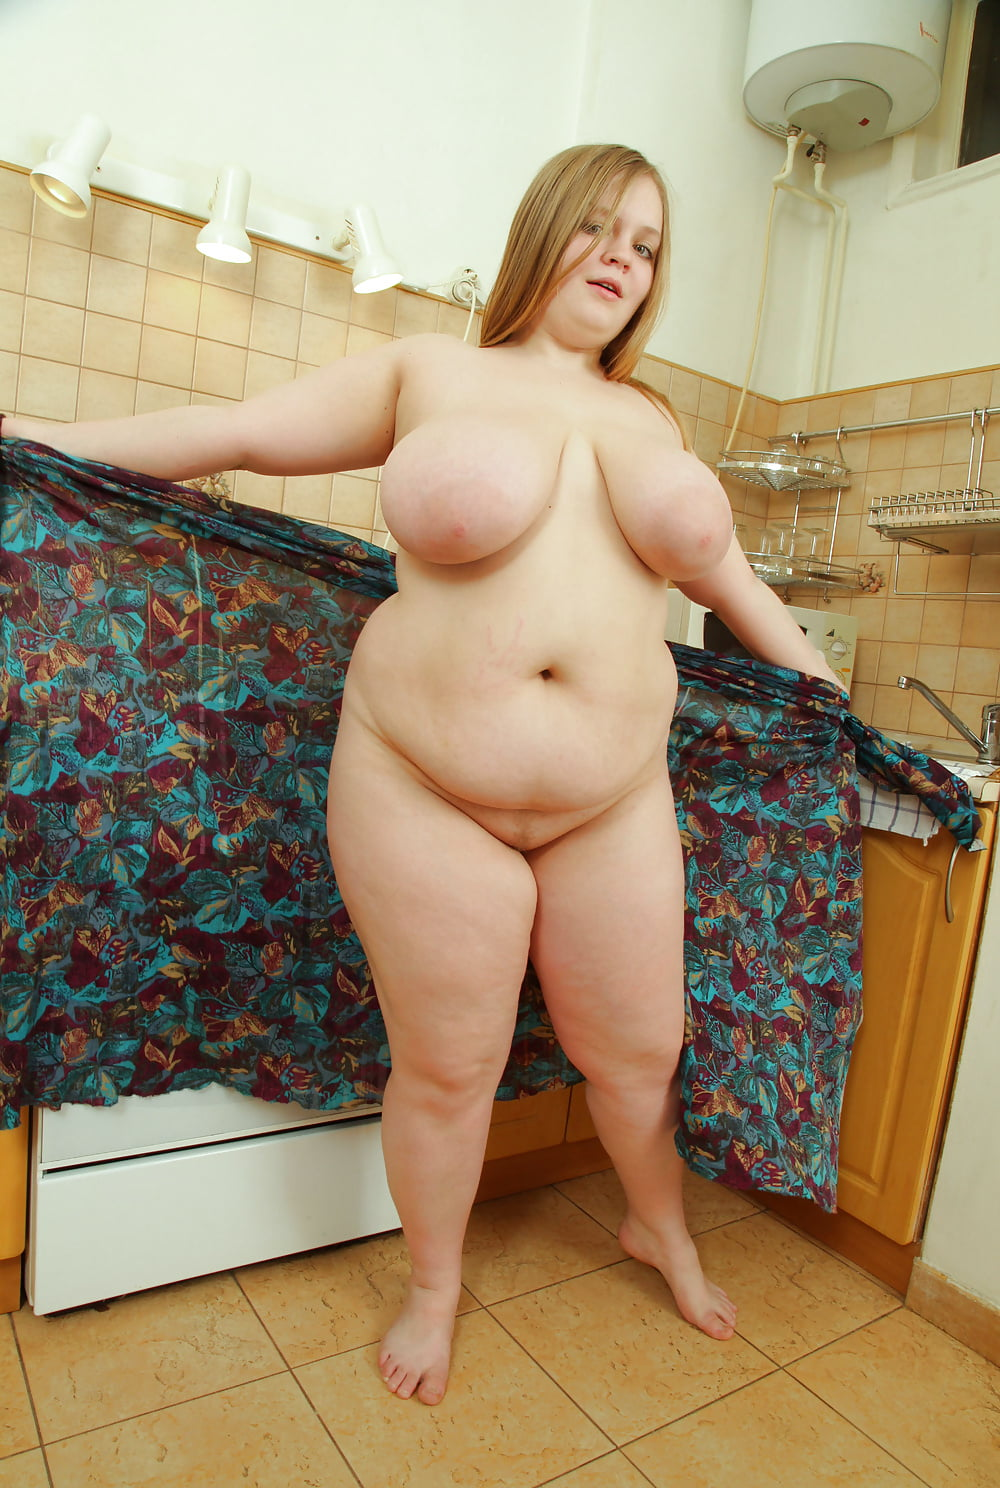 naked-fat-amutures-girls-tamil-nadu-girls-booms-photos